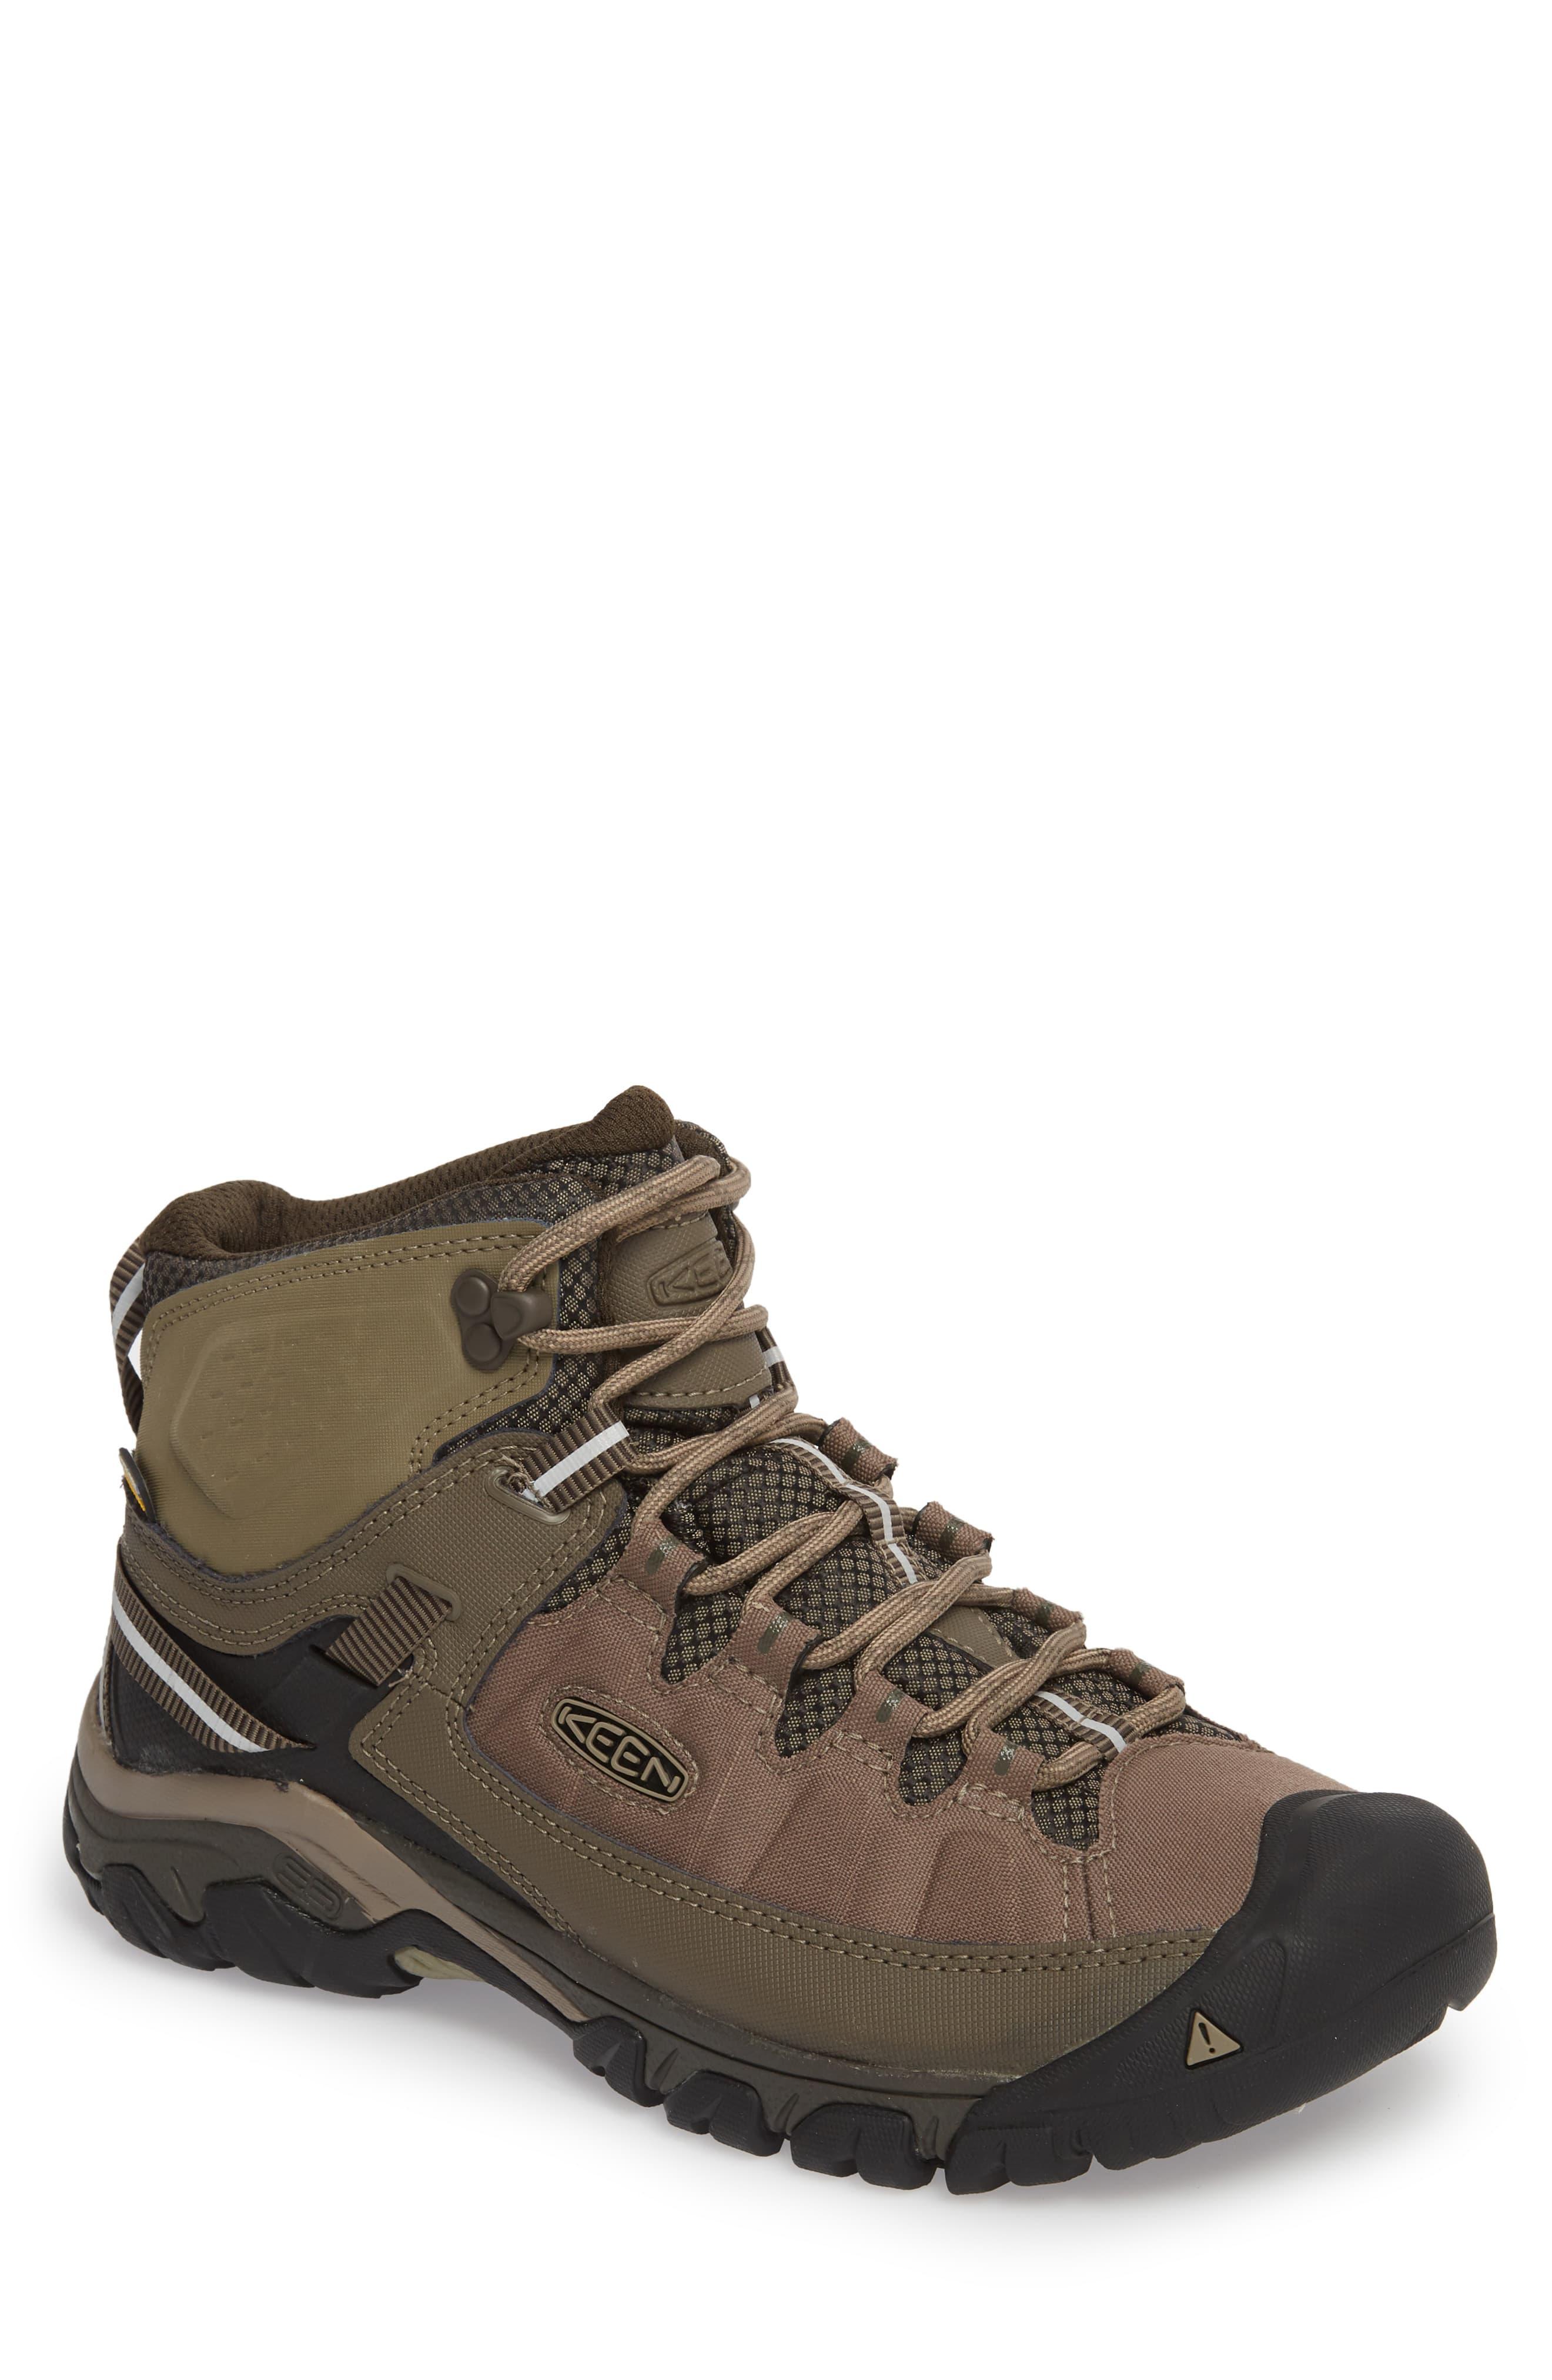 keen mid hiking boots men's